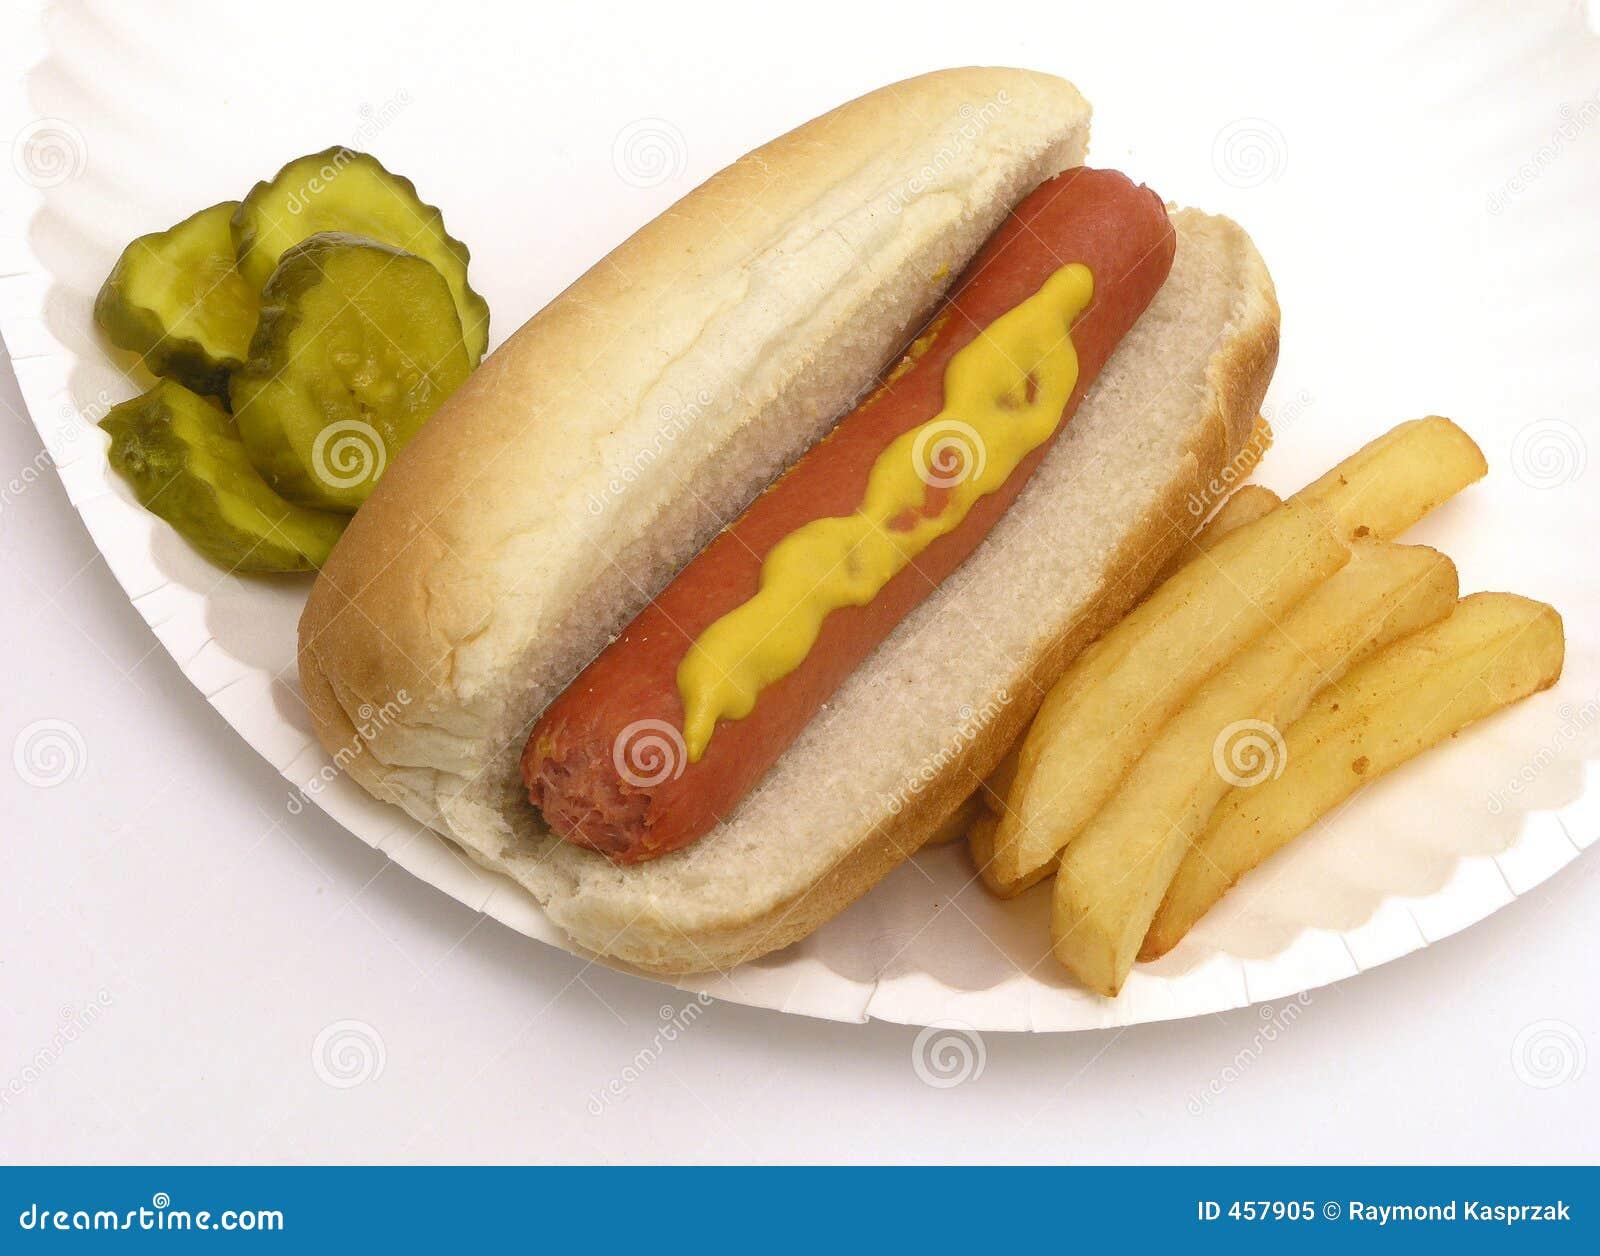 Hot Dog Fries Pickles